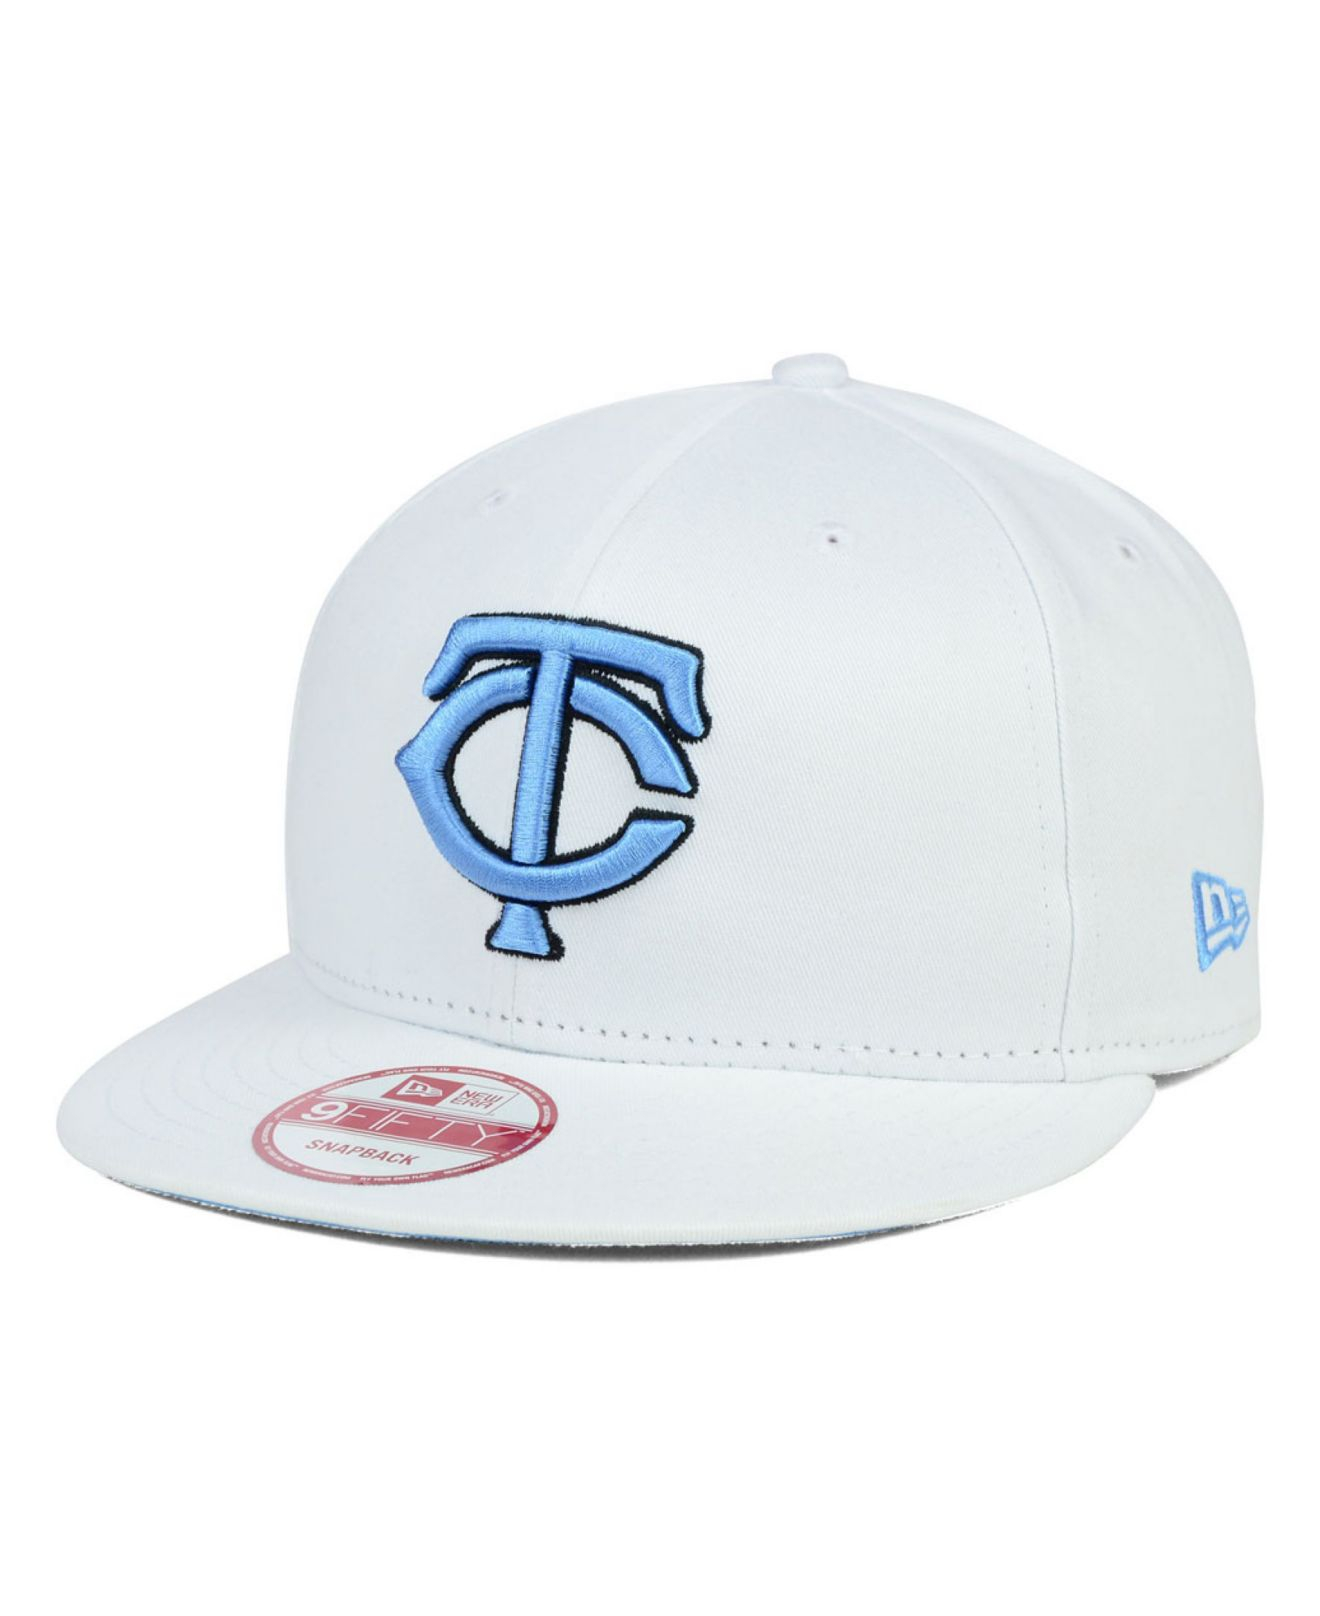 e38286c281858 ... where can i buy lyst ktz minnesota twins legend blue hook 9fifty  snapback cap in white